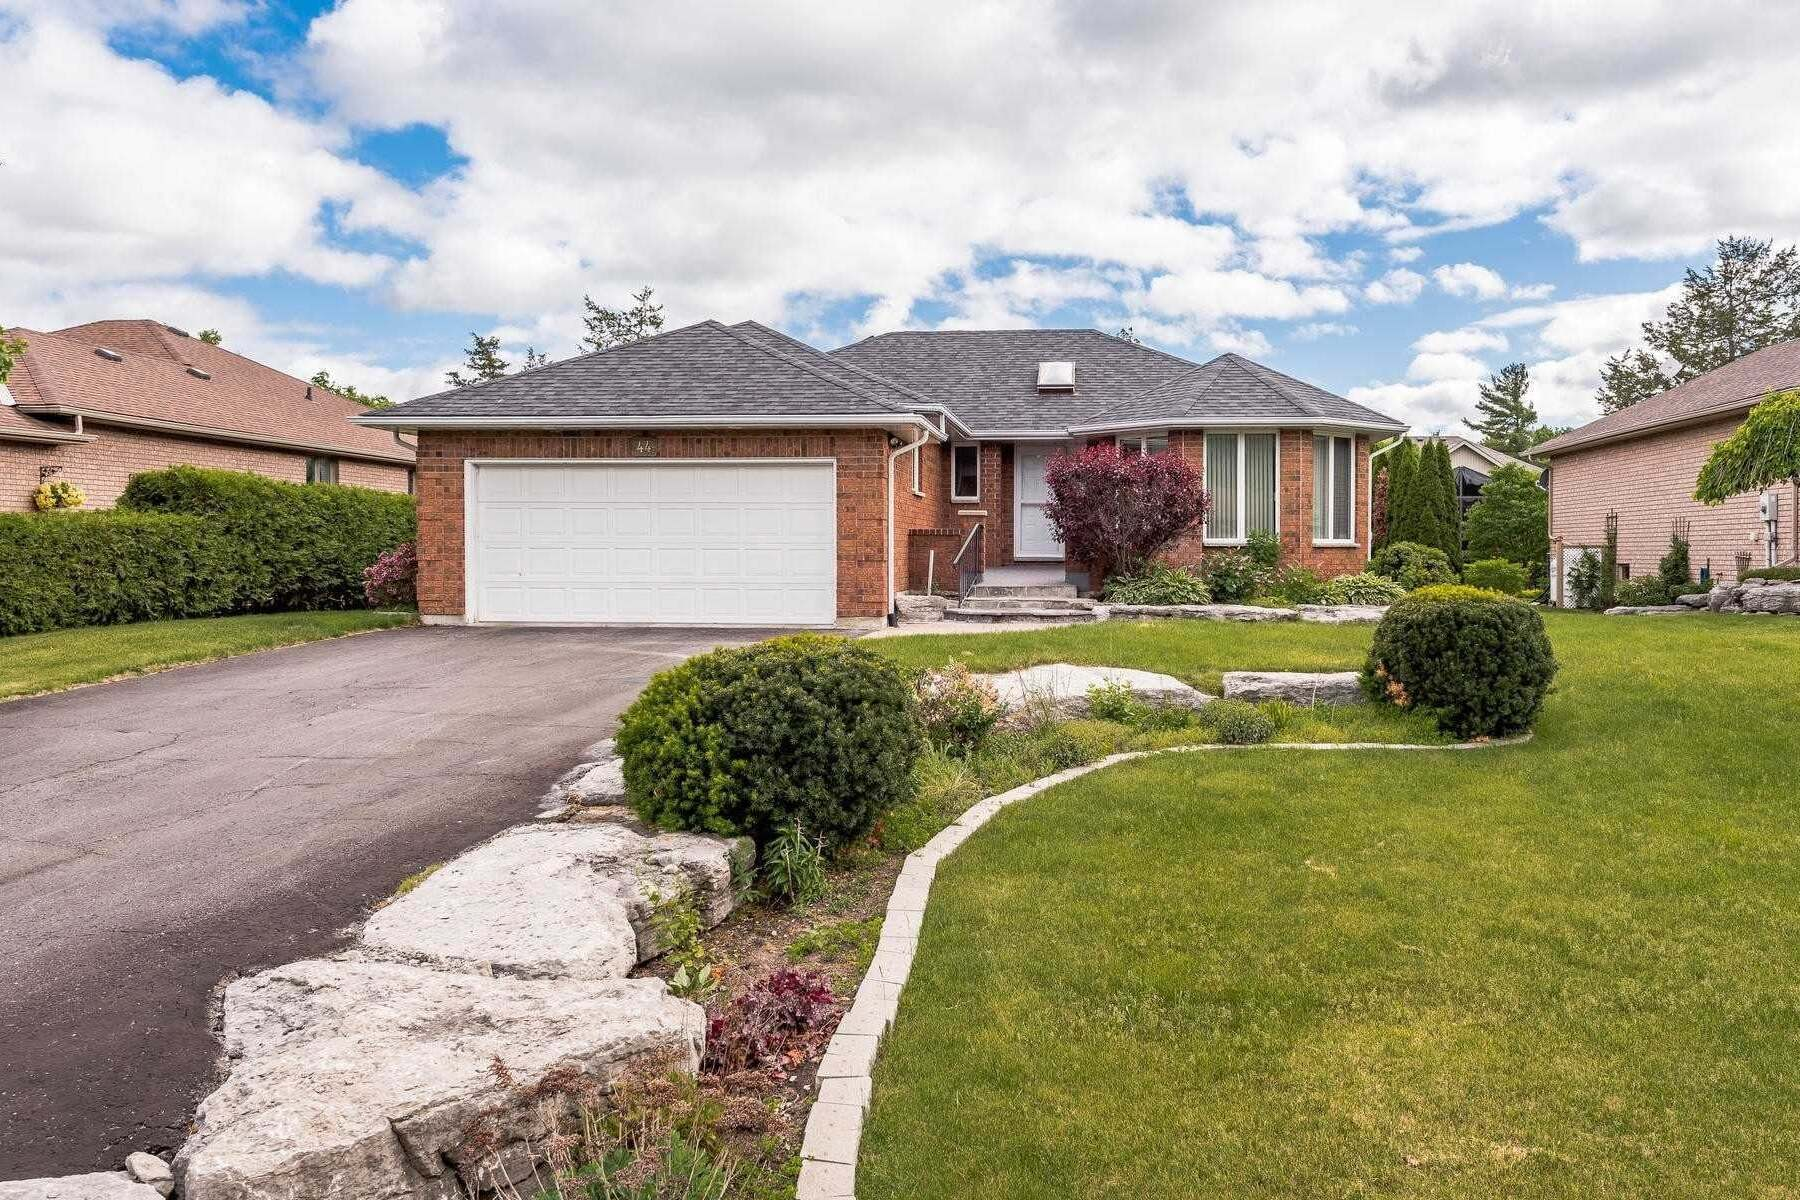 House for sale at 44 Island Bay Dr Kawartha Lakes Ontario - MLS: X4782773